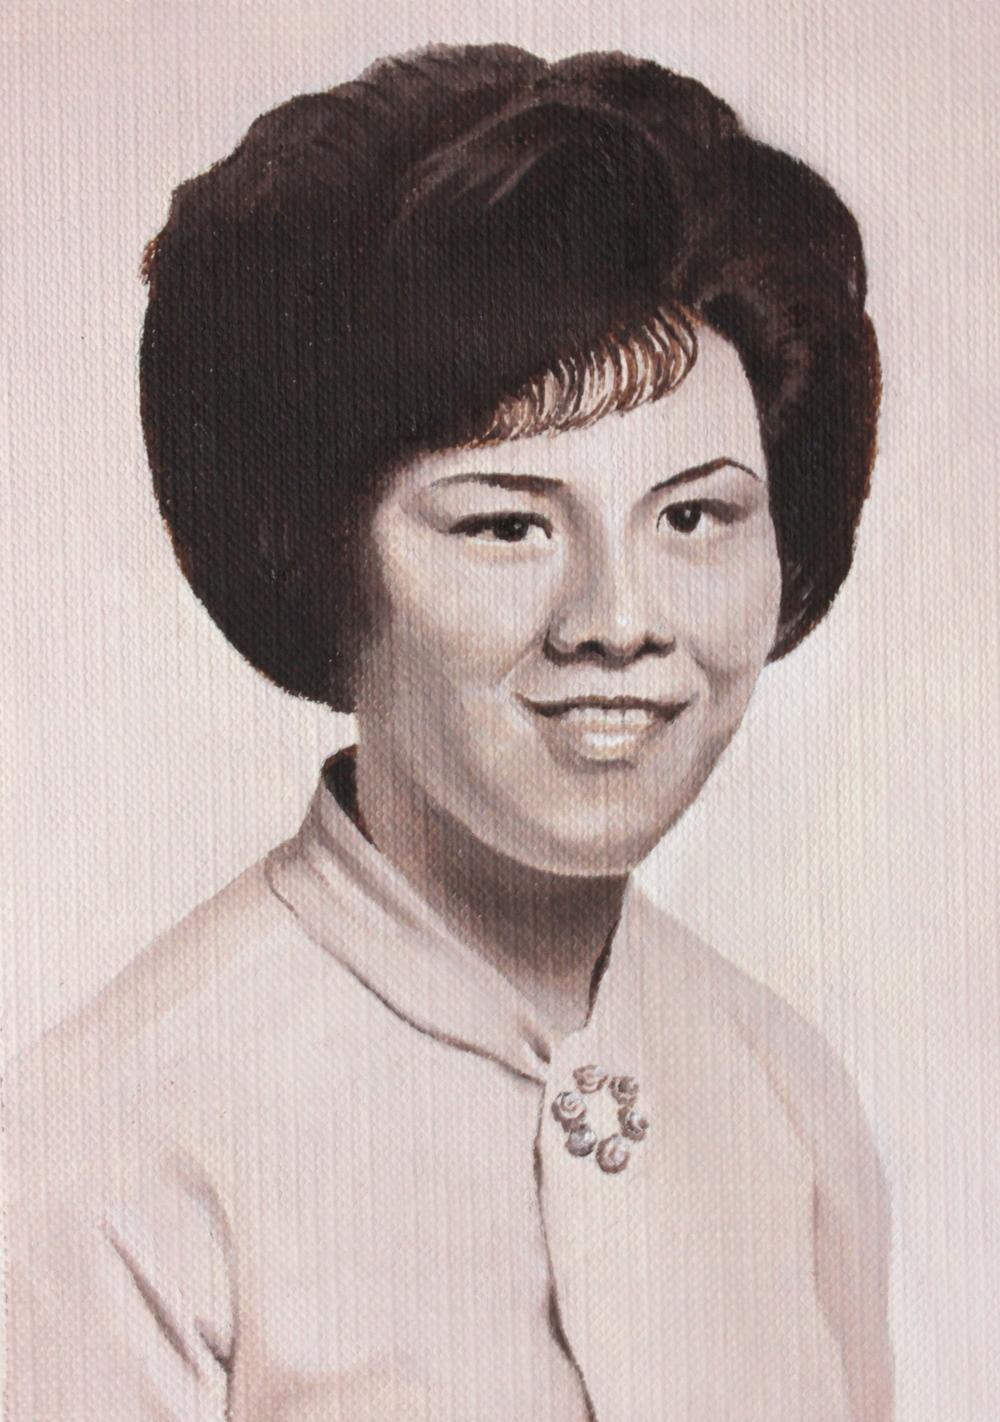 Portrait of Lorie